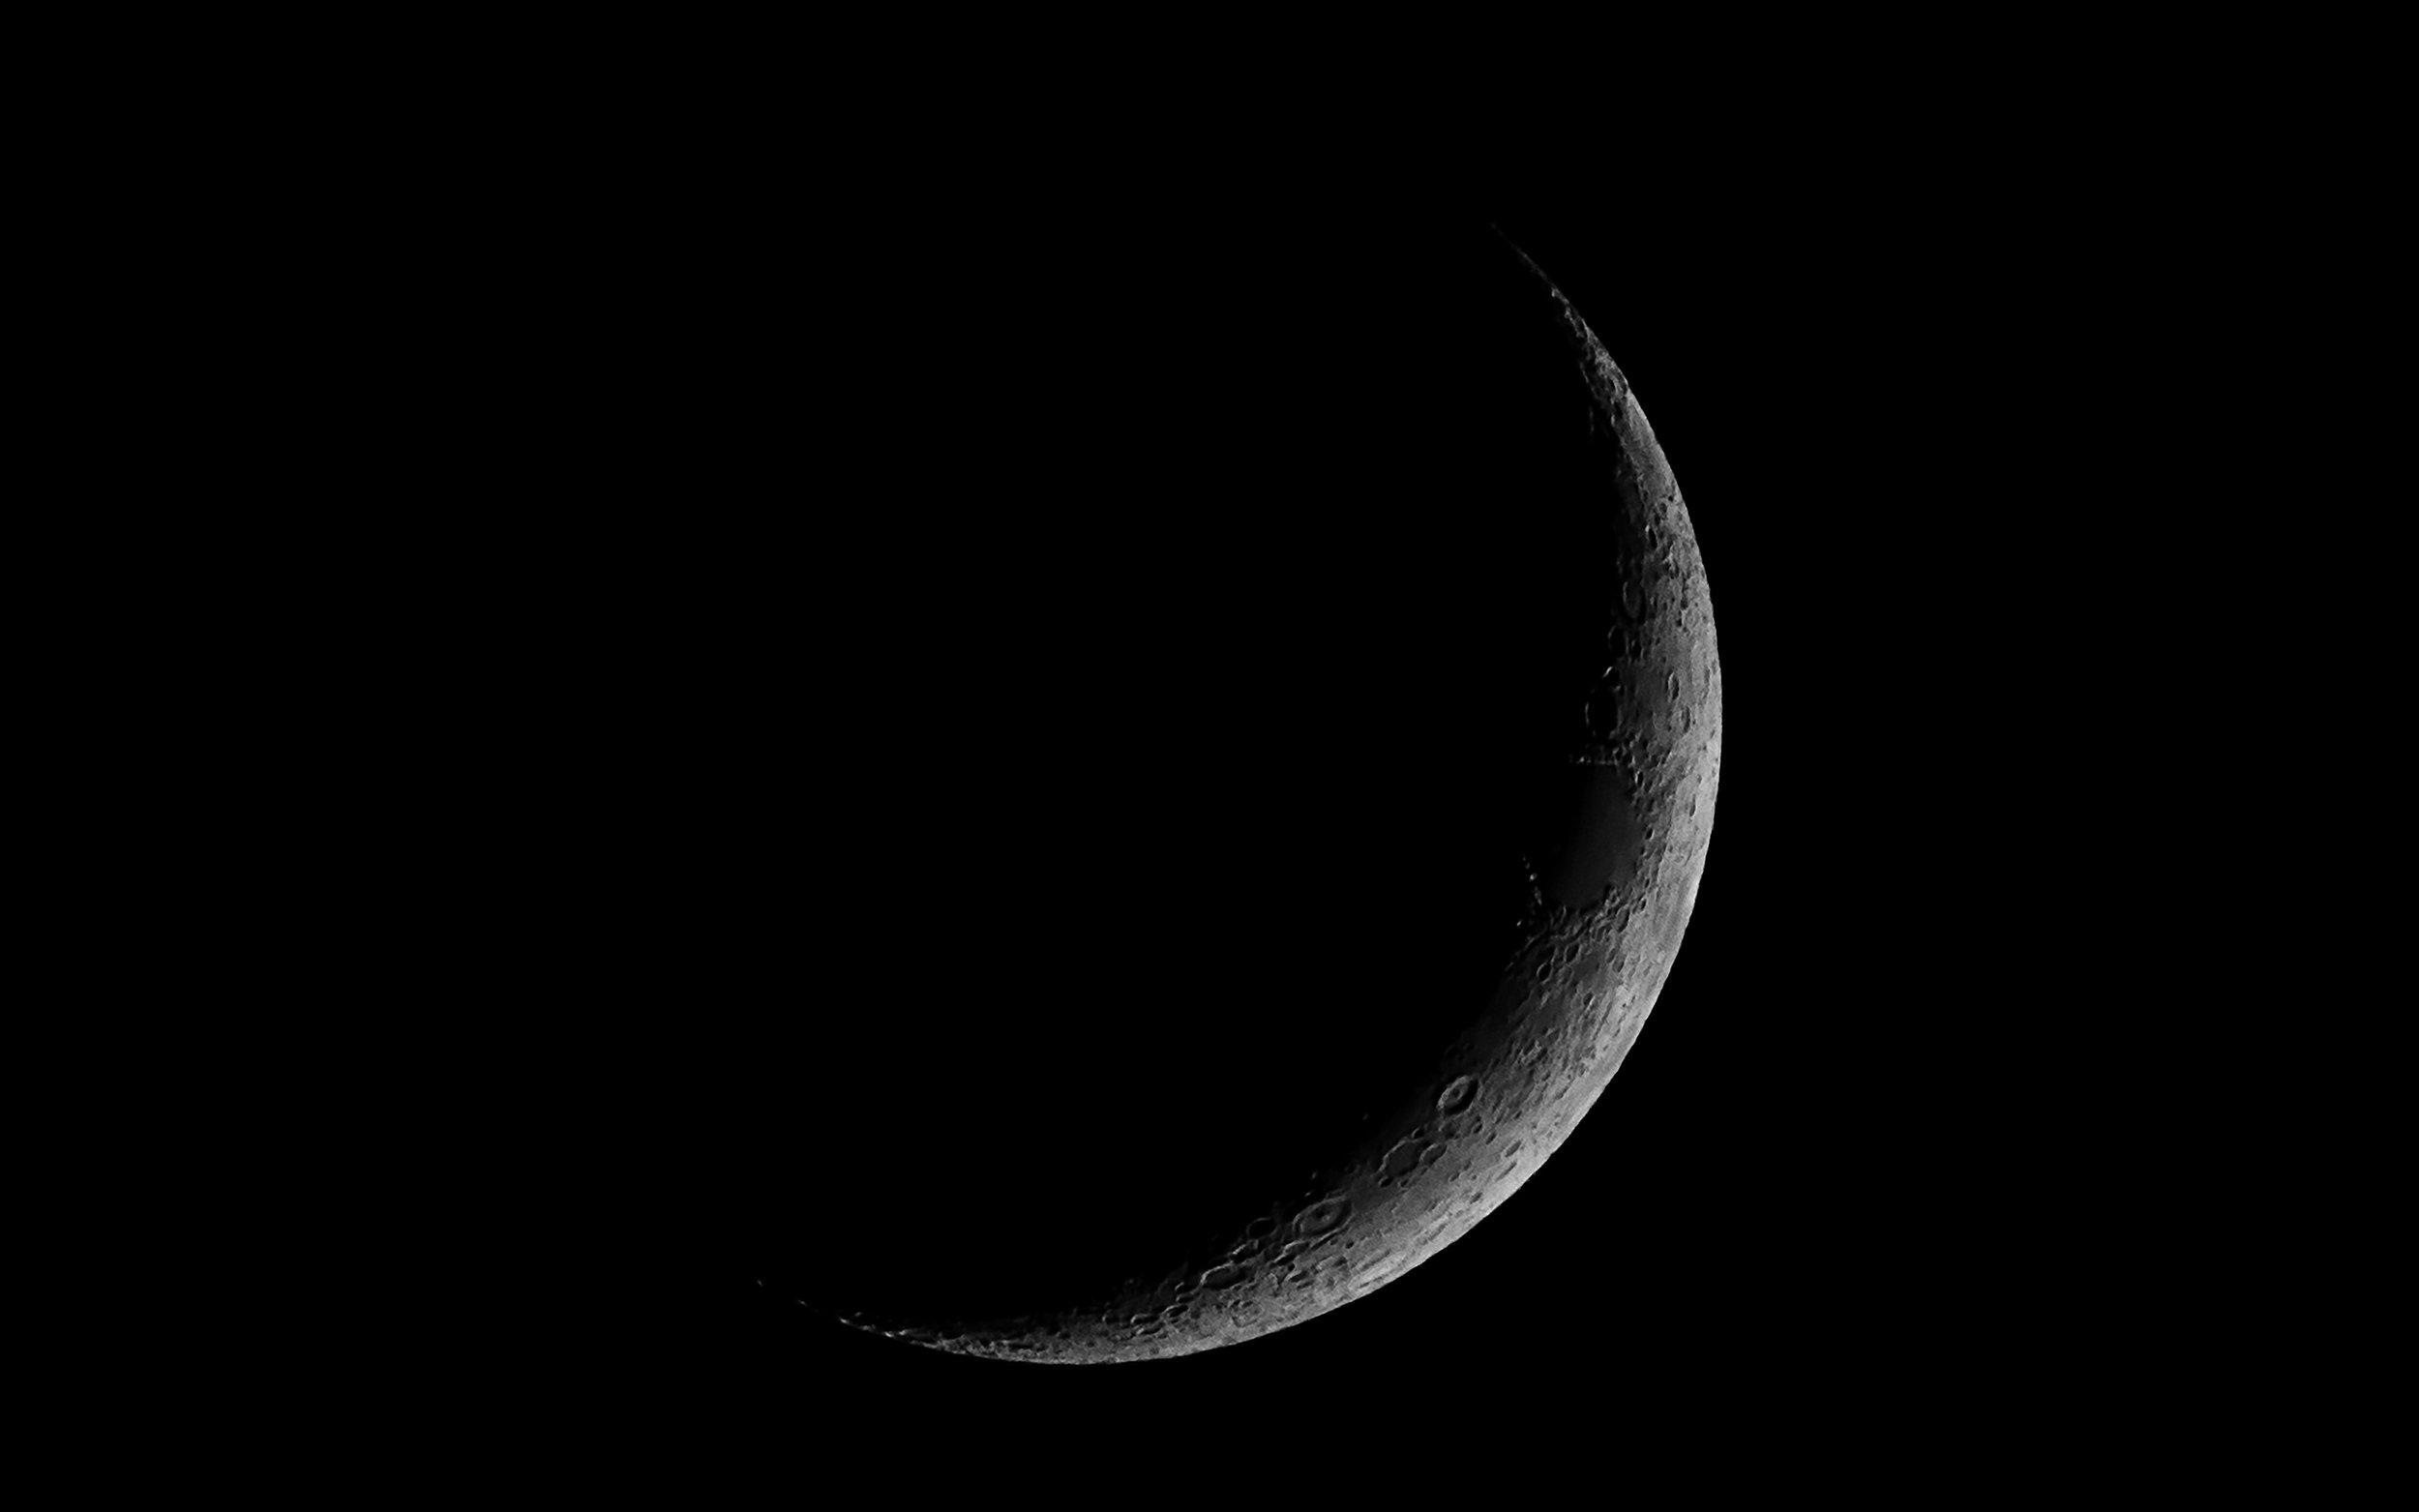 Waxing Crescent Moon 8% Illumination